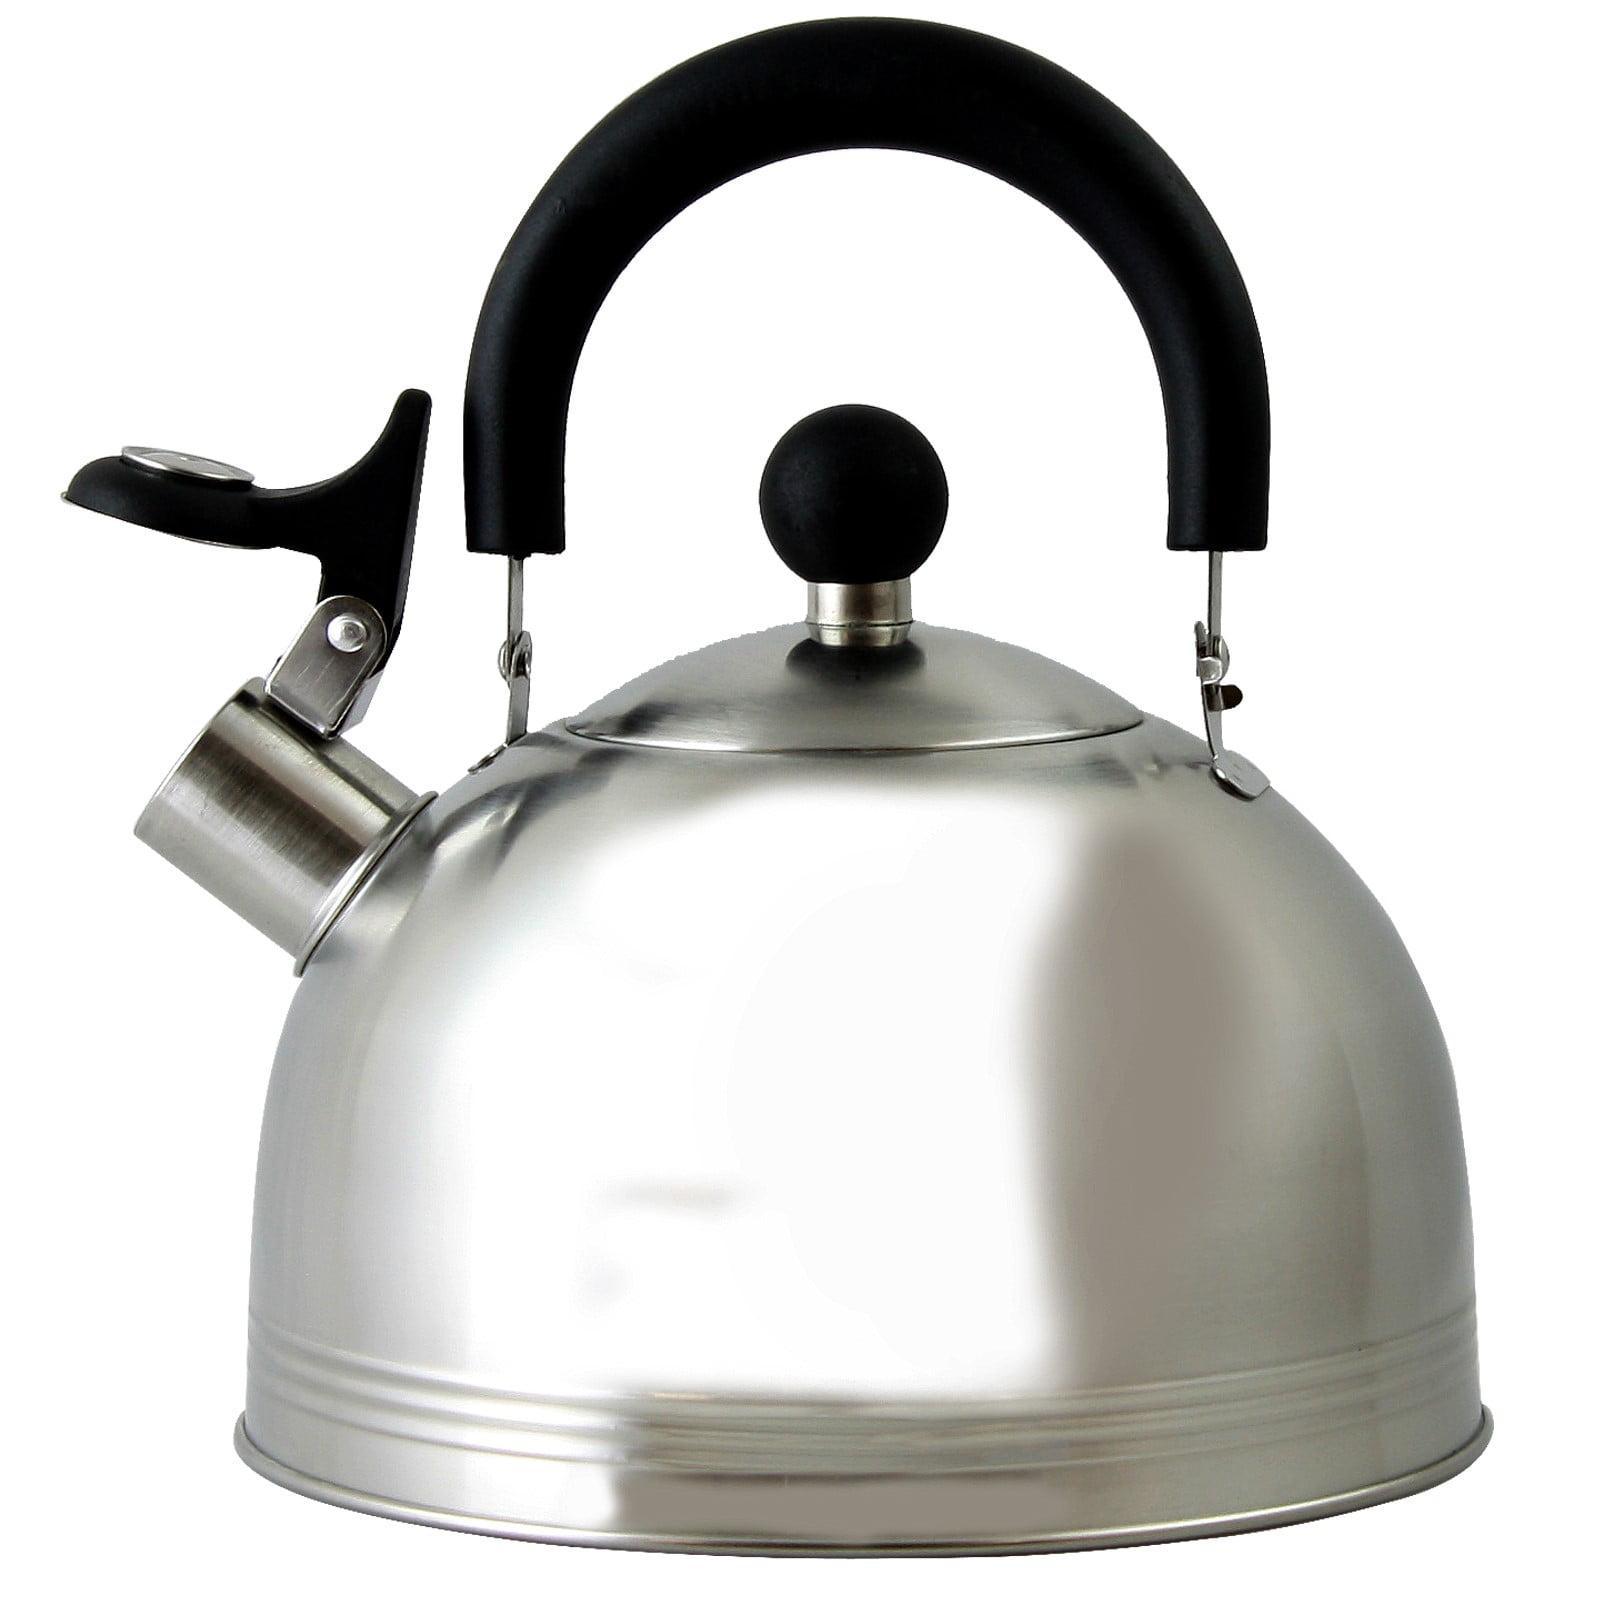 Mr. Coffee Carterton 1.5 Qt Stainless Steel Whistling Tea Kettle